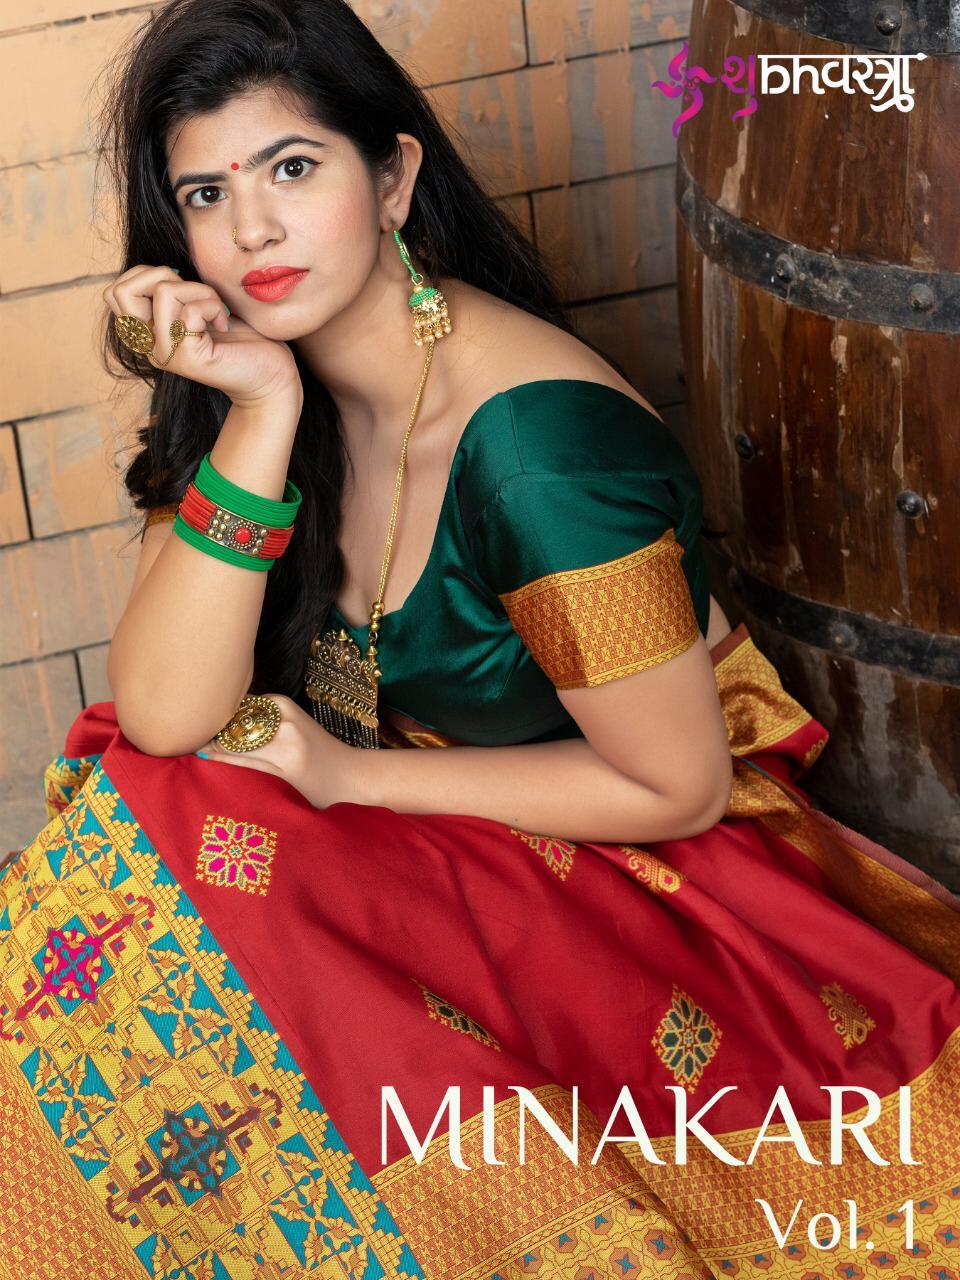 Shubh Vastra Present Minakari Vol 1 Banarasi Silk Traditional Wear Saree Wholesaler